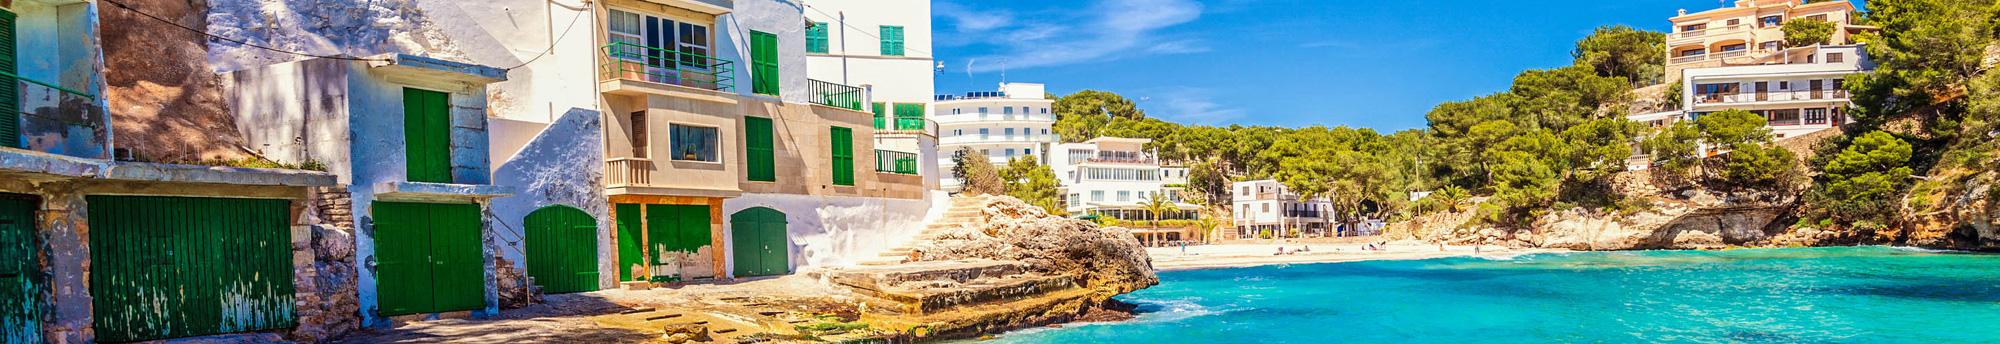 Viaje às Ilhas Baleares: Pacotes Voo + Hotel!